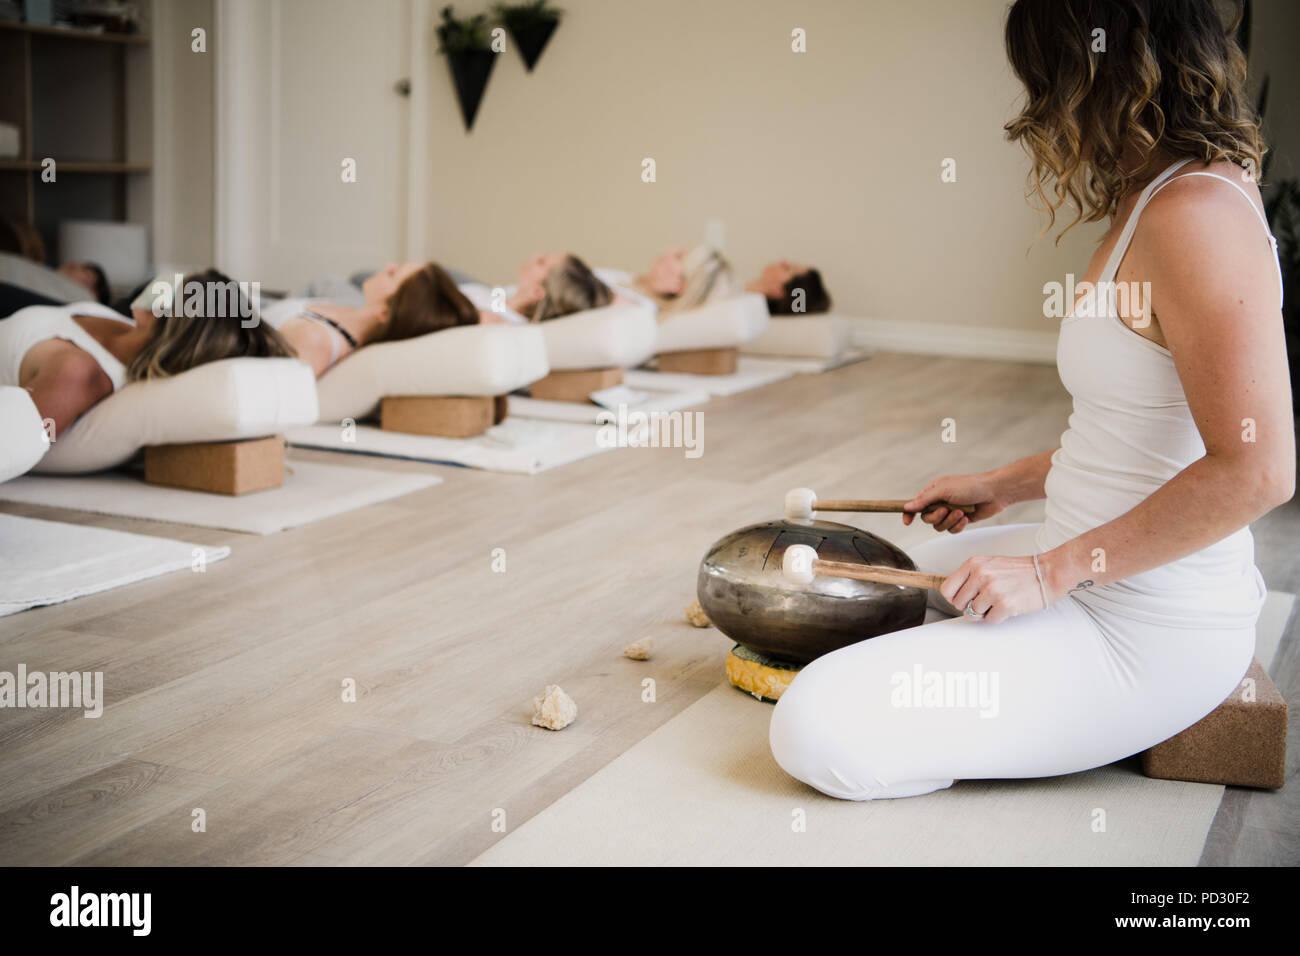 Frauen in Entspannung Pose nach Yoga Klasse bei Rückzug Stockbild